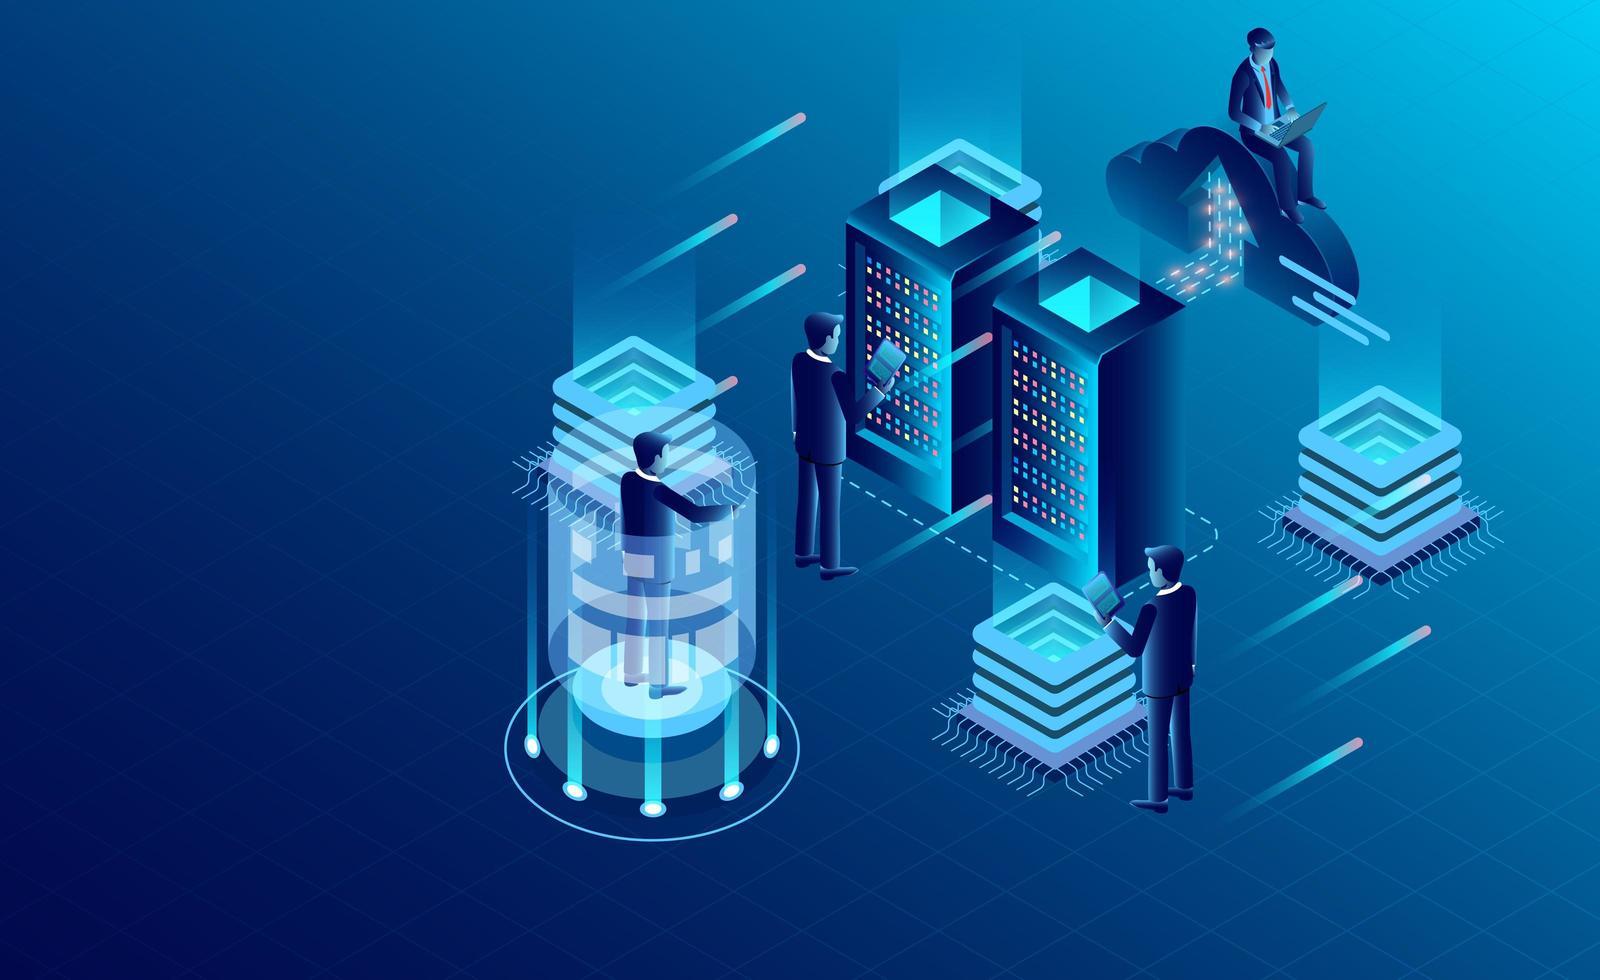 Datacenter serverruimte cloud opslag technologie concept vector